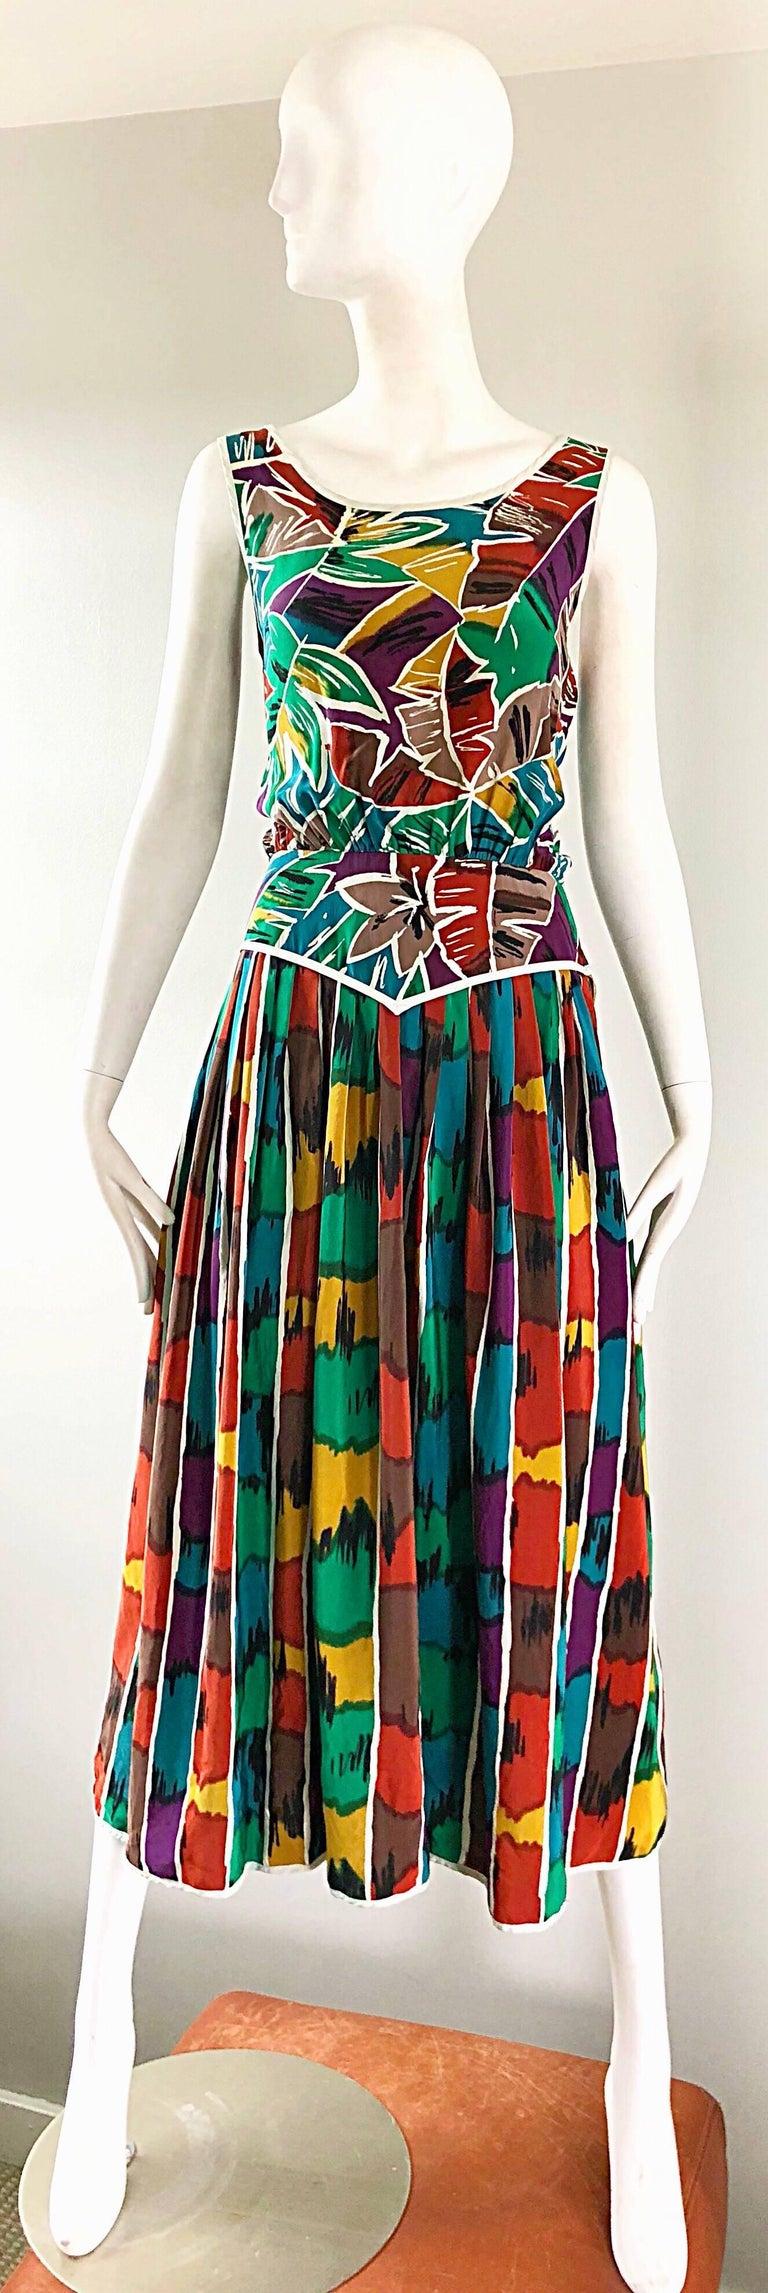 Vintage Oscar de la Renta Size 8 / 10 Kaleidoscope Print Silk Sleeveless Dress For Sale 9